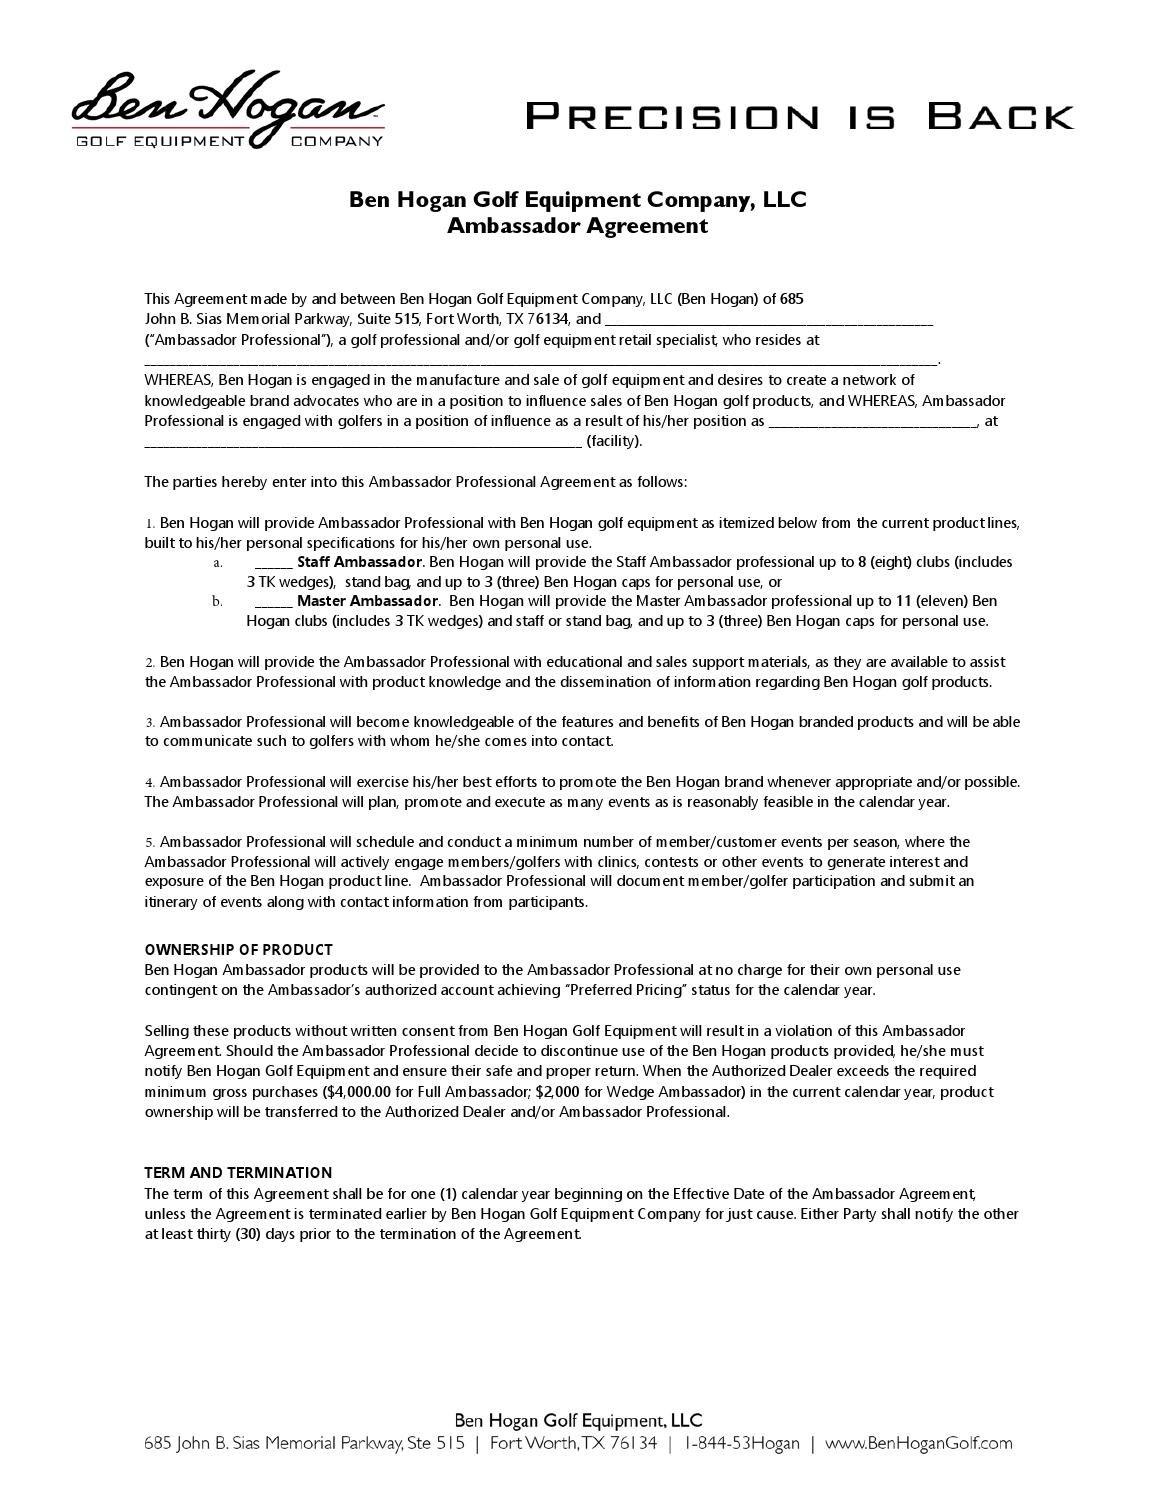 Ambassador Agreementben Hogan Golf  Issuu With Brand Ambassador Agreement Template